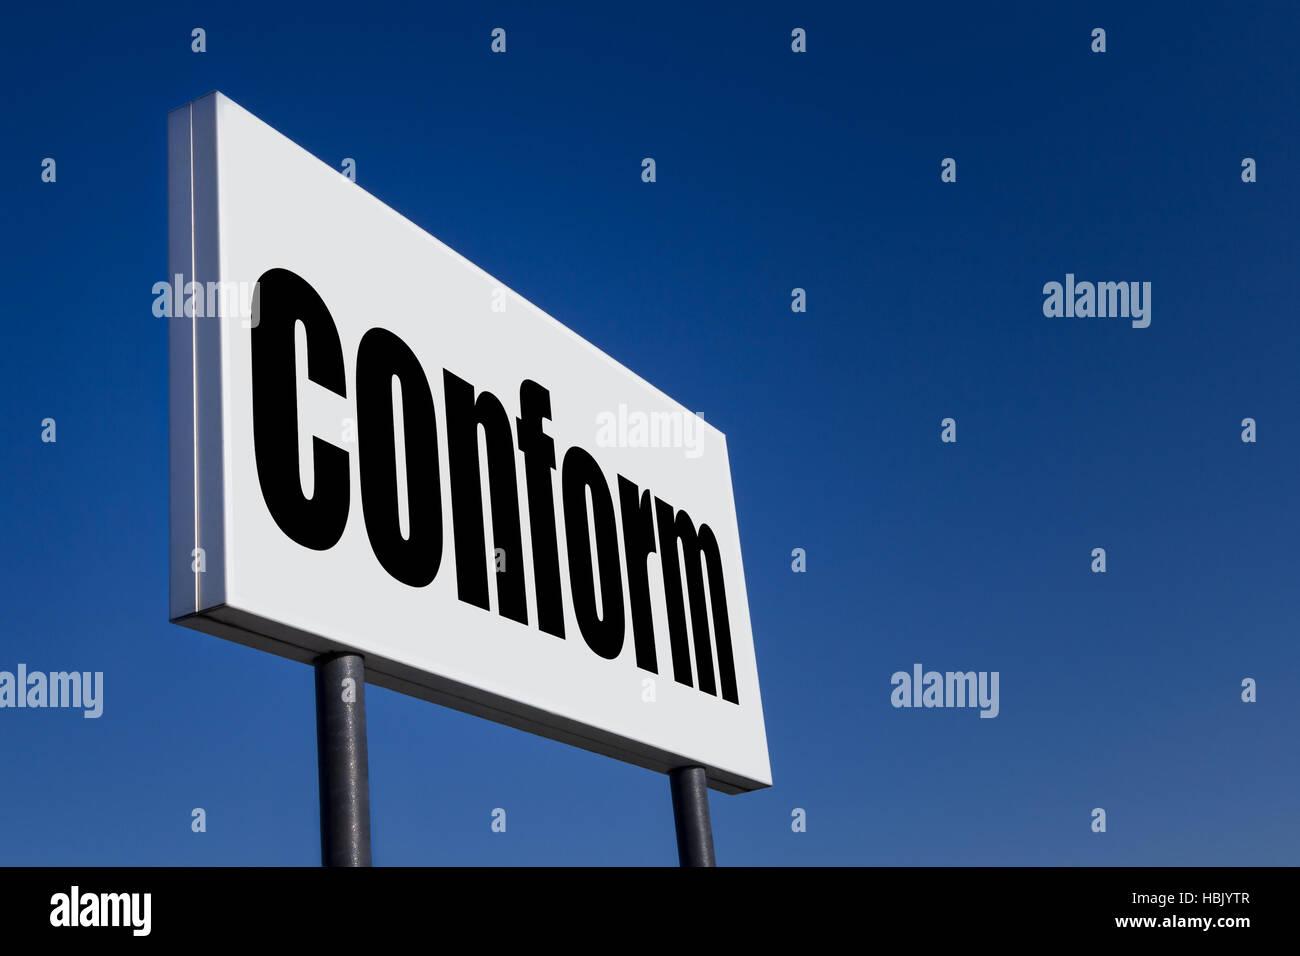 Message CONFORM - Stock Image